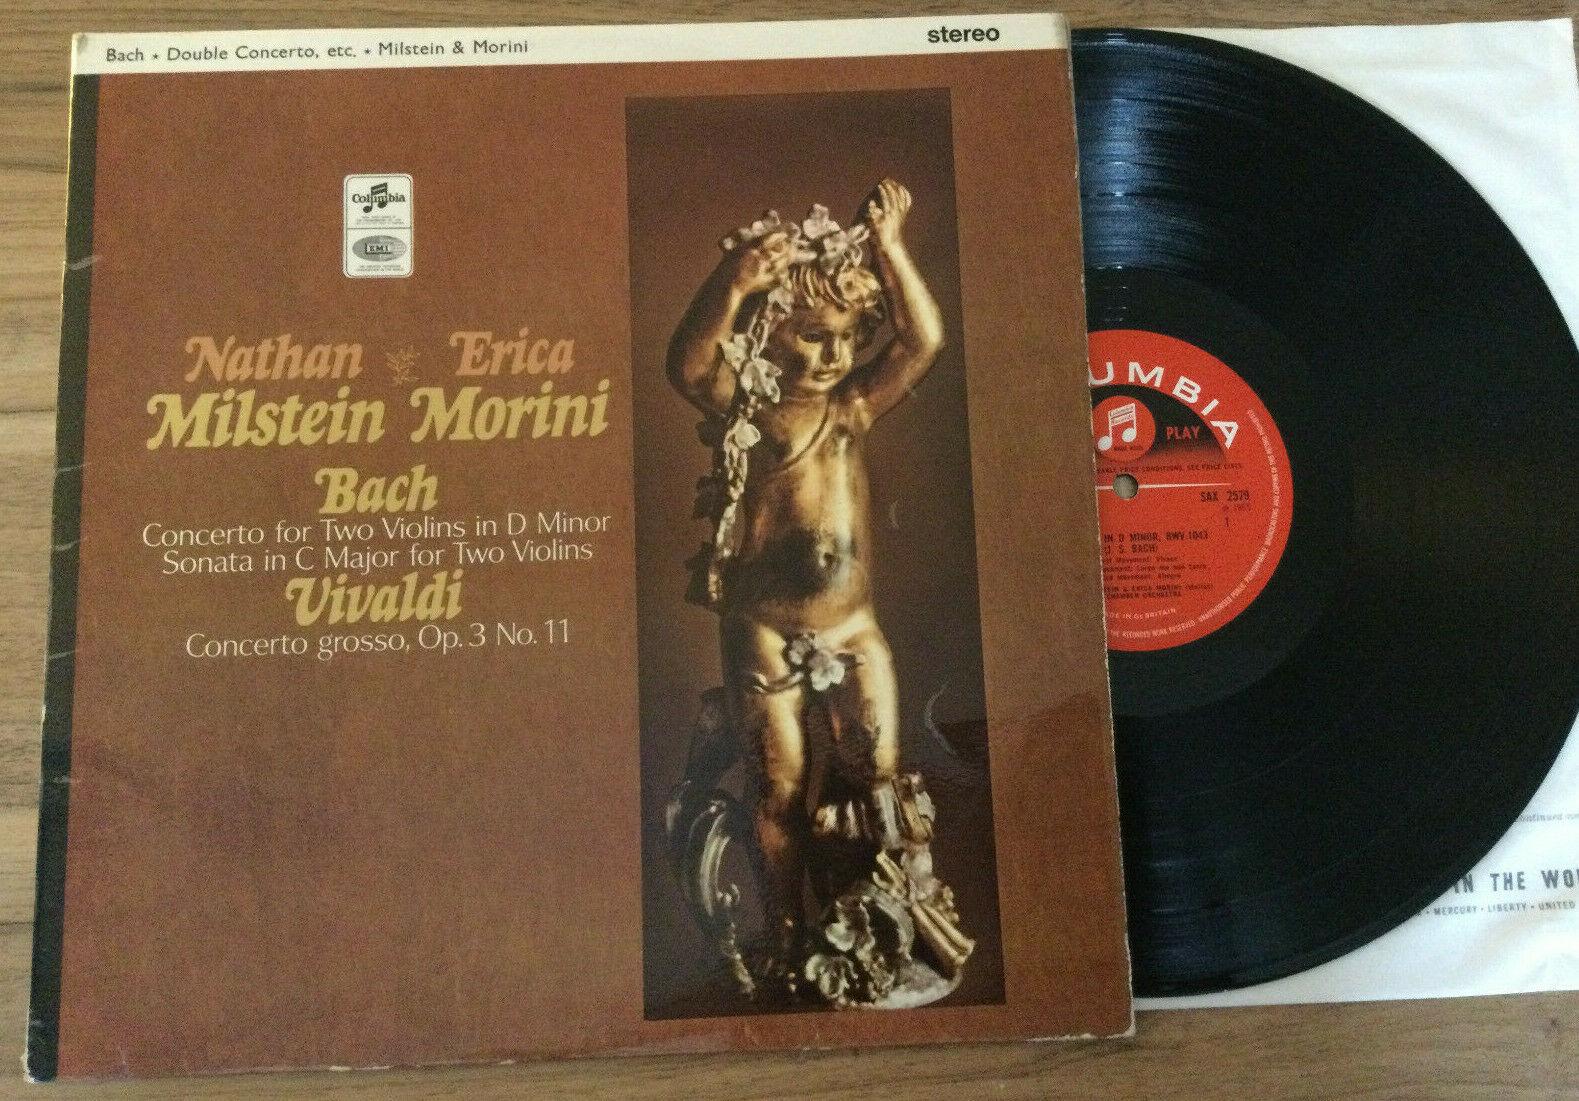 SAX 2579 BACH Double Concerto Milstein   Morini UK 1965  Rare Columbia LP